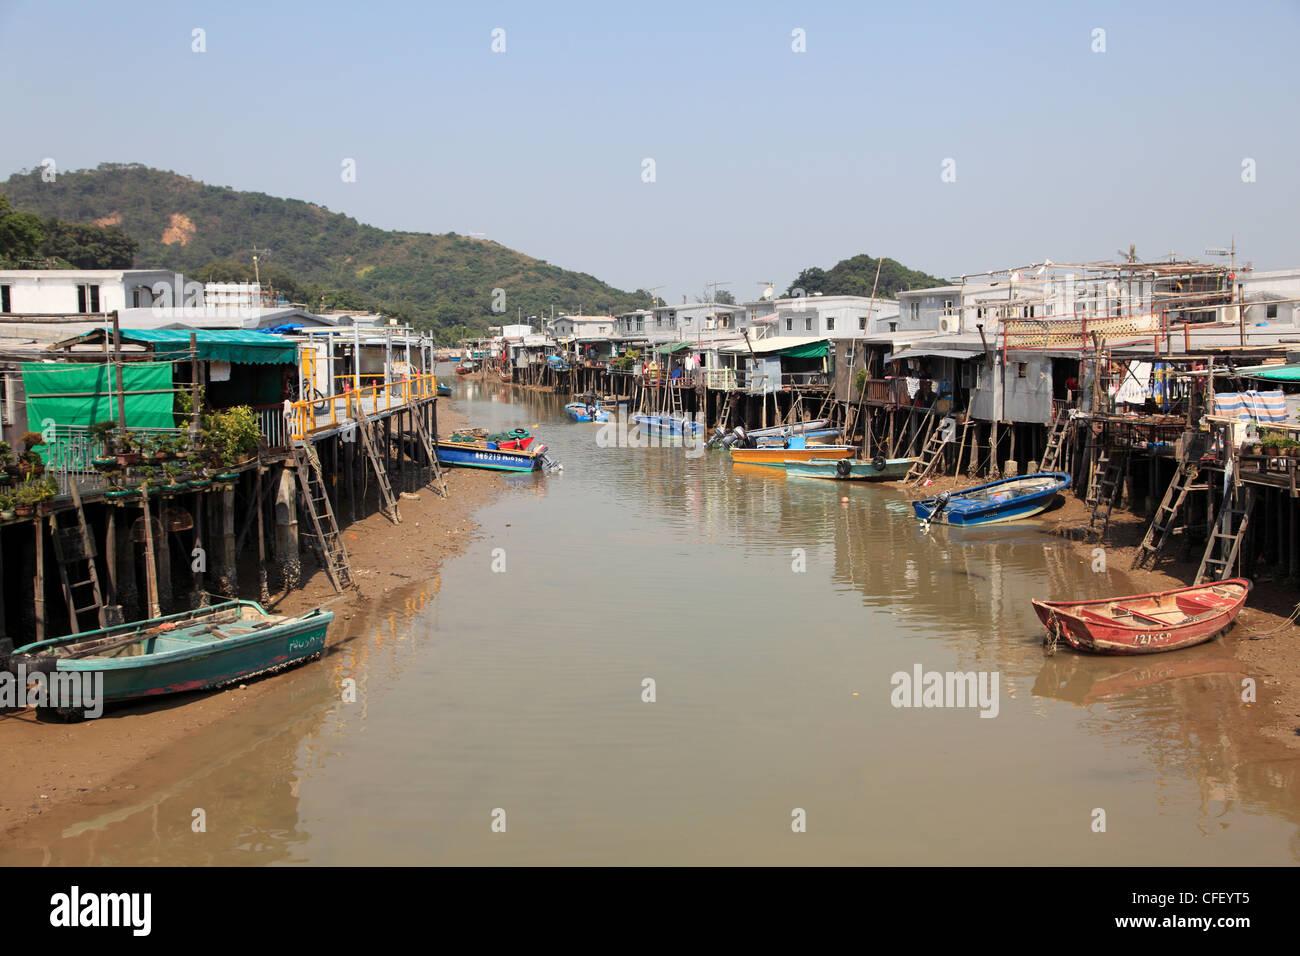 Stilt Houses, Tai O fishing village, Lantau Island, Hong Kong, China, Asia - Stock Image